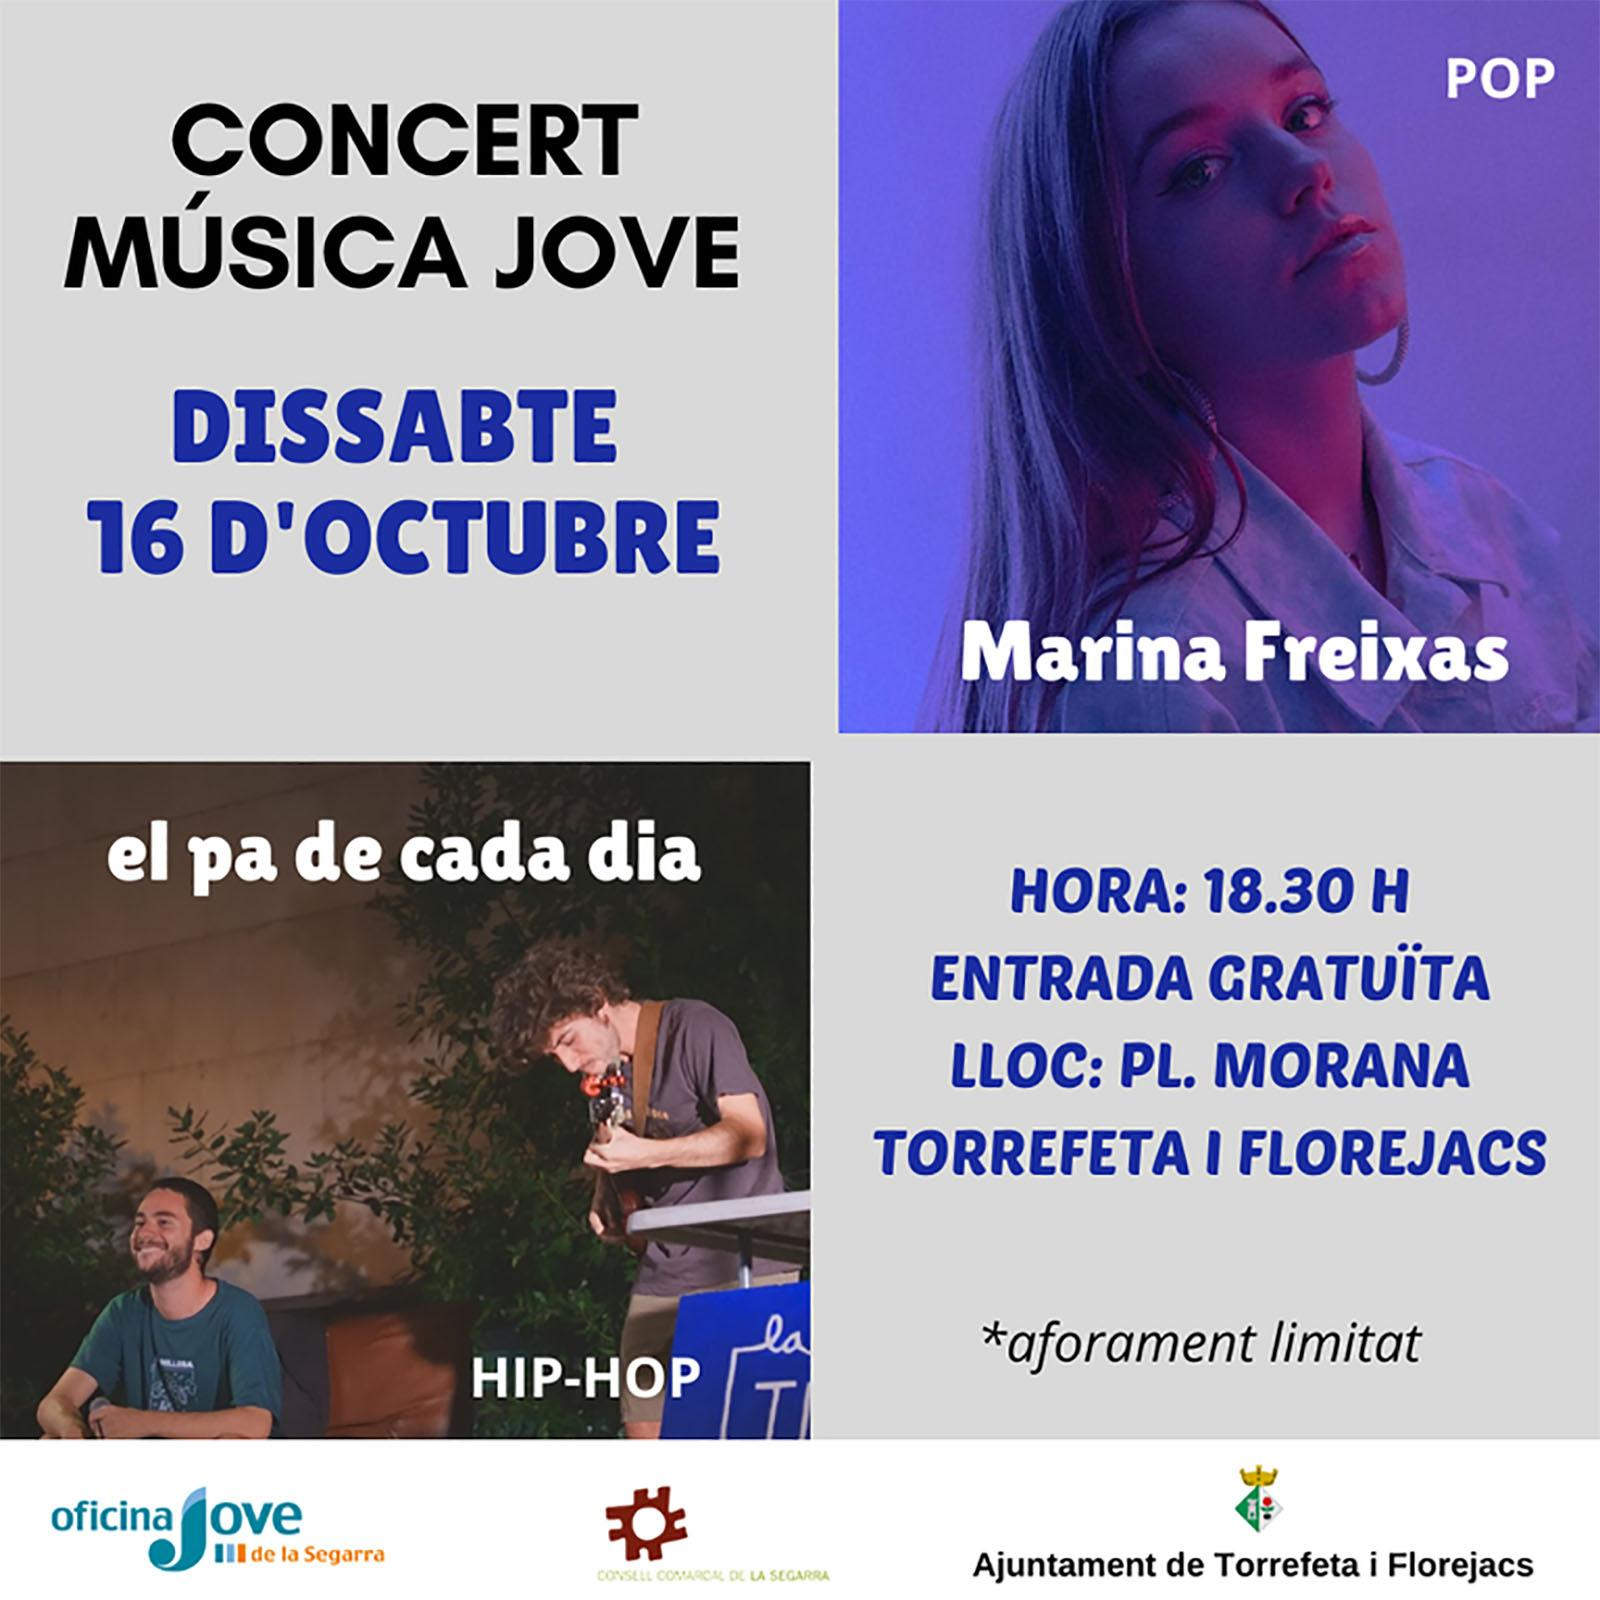 cartell Concert de música jove